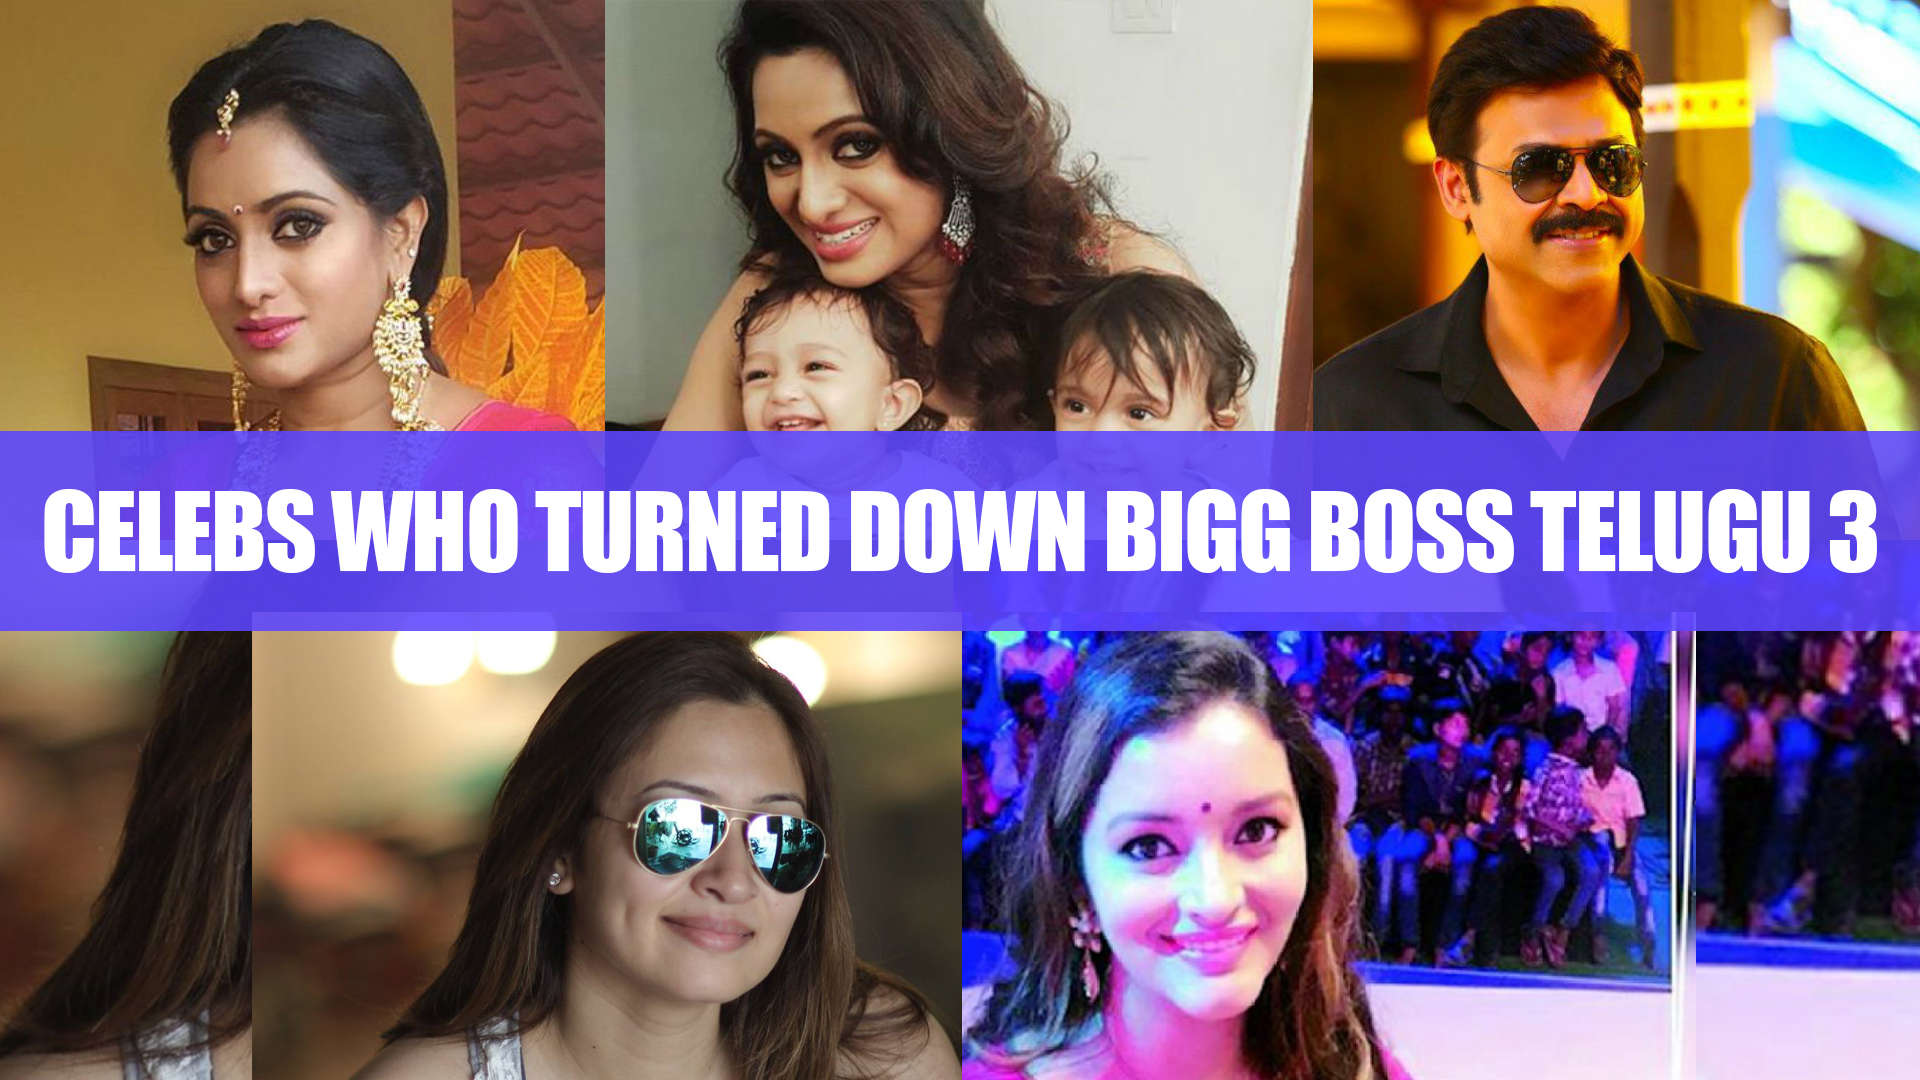 Rashmi Gautam to Jwala Gutta: Telugu celebs who turned down Bigg Boss  Telugu 3